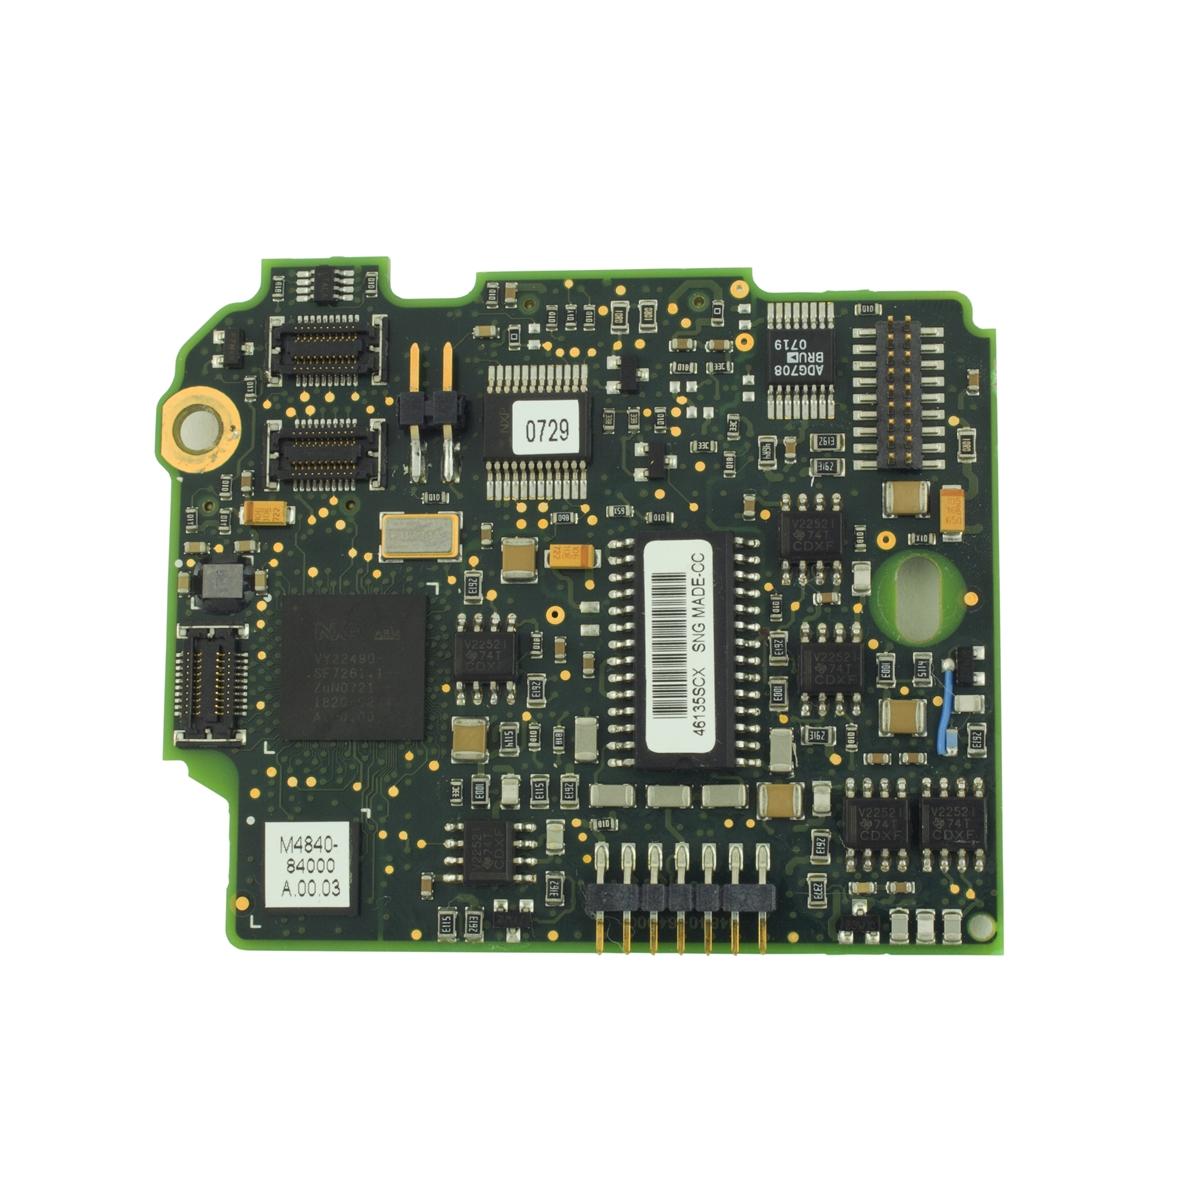 Philips IntelliVue M2601B Telemetry Transmitter S02 SpO2 Circuit Board PC Assembly